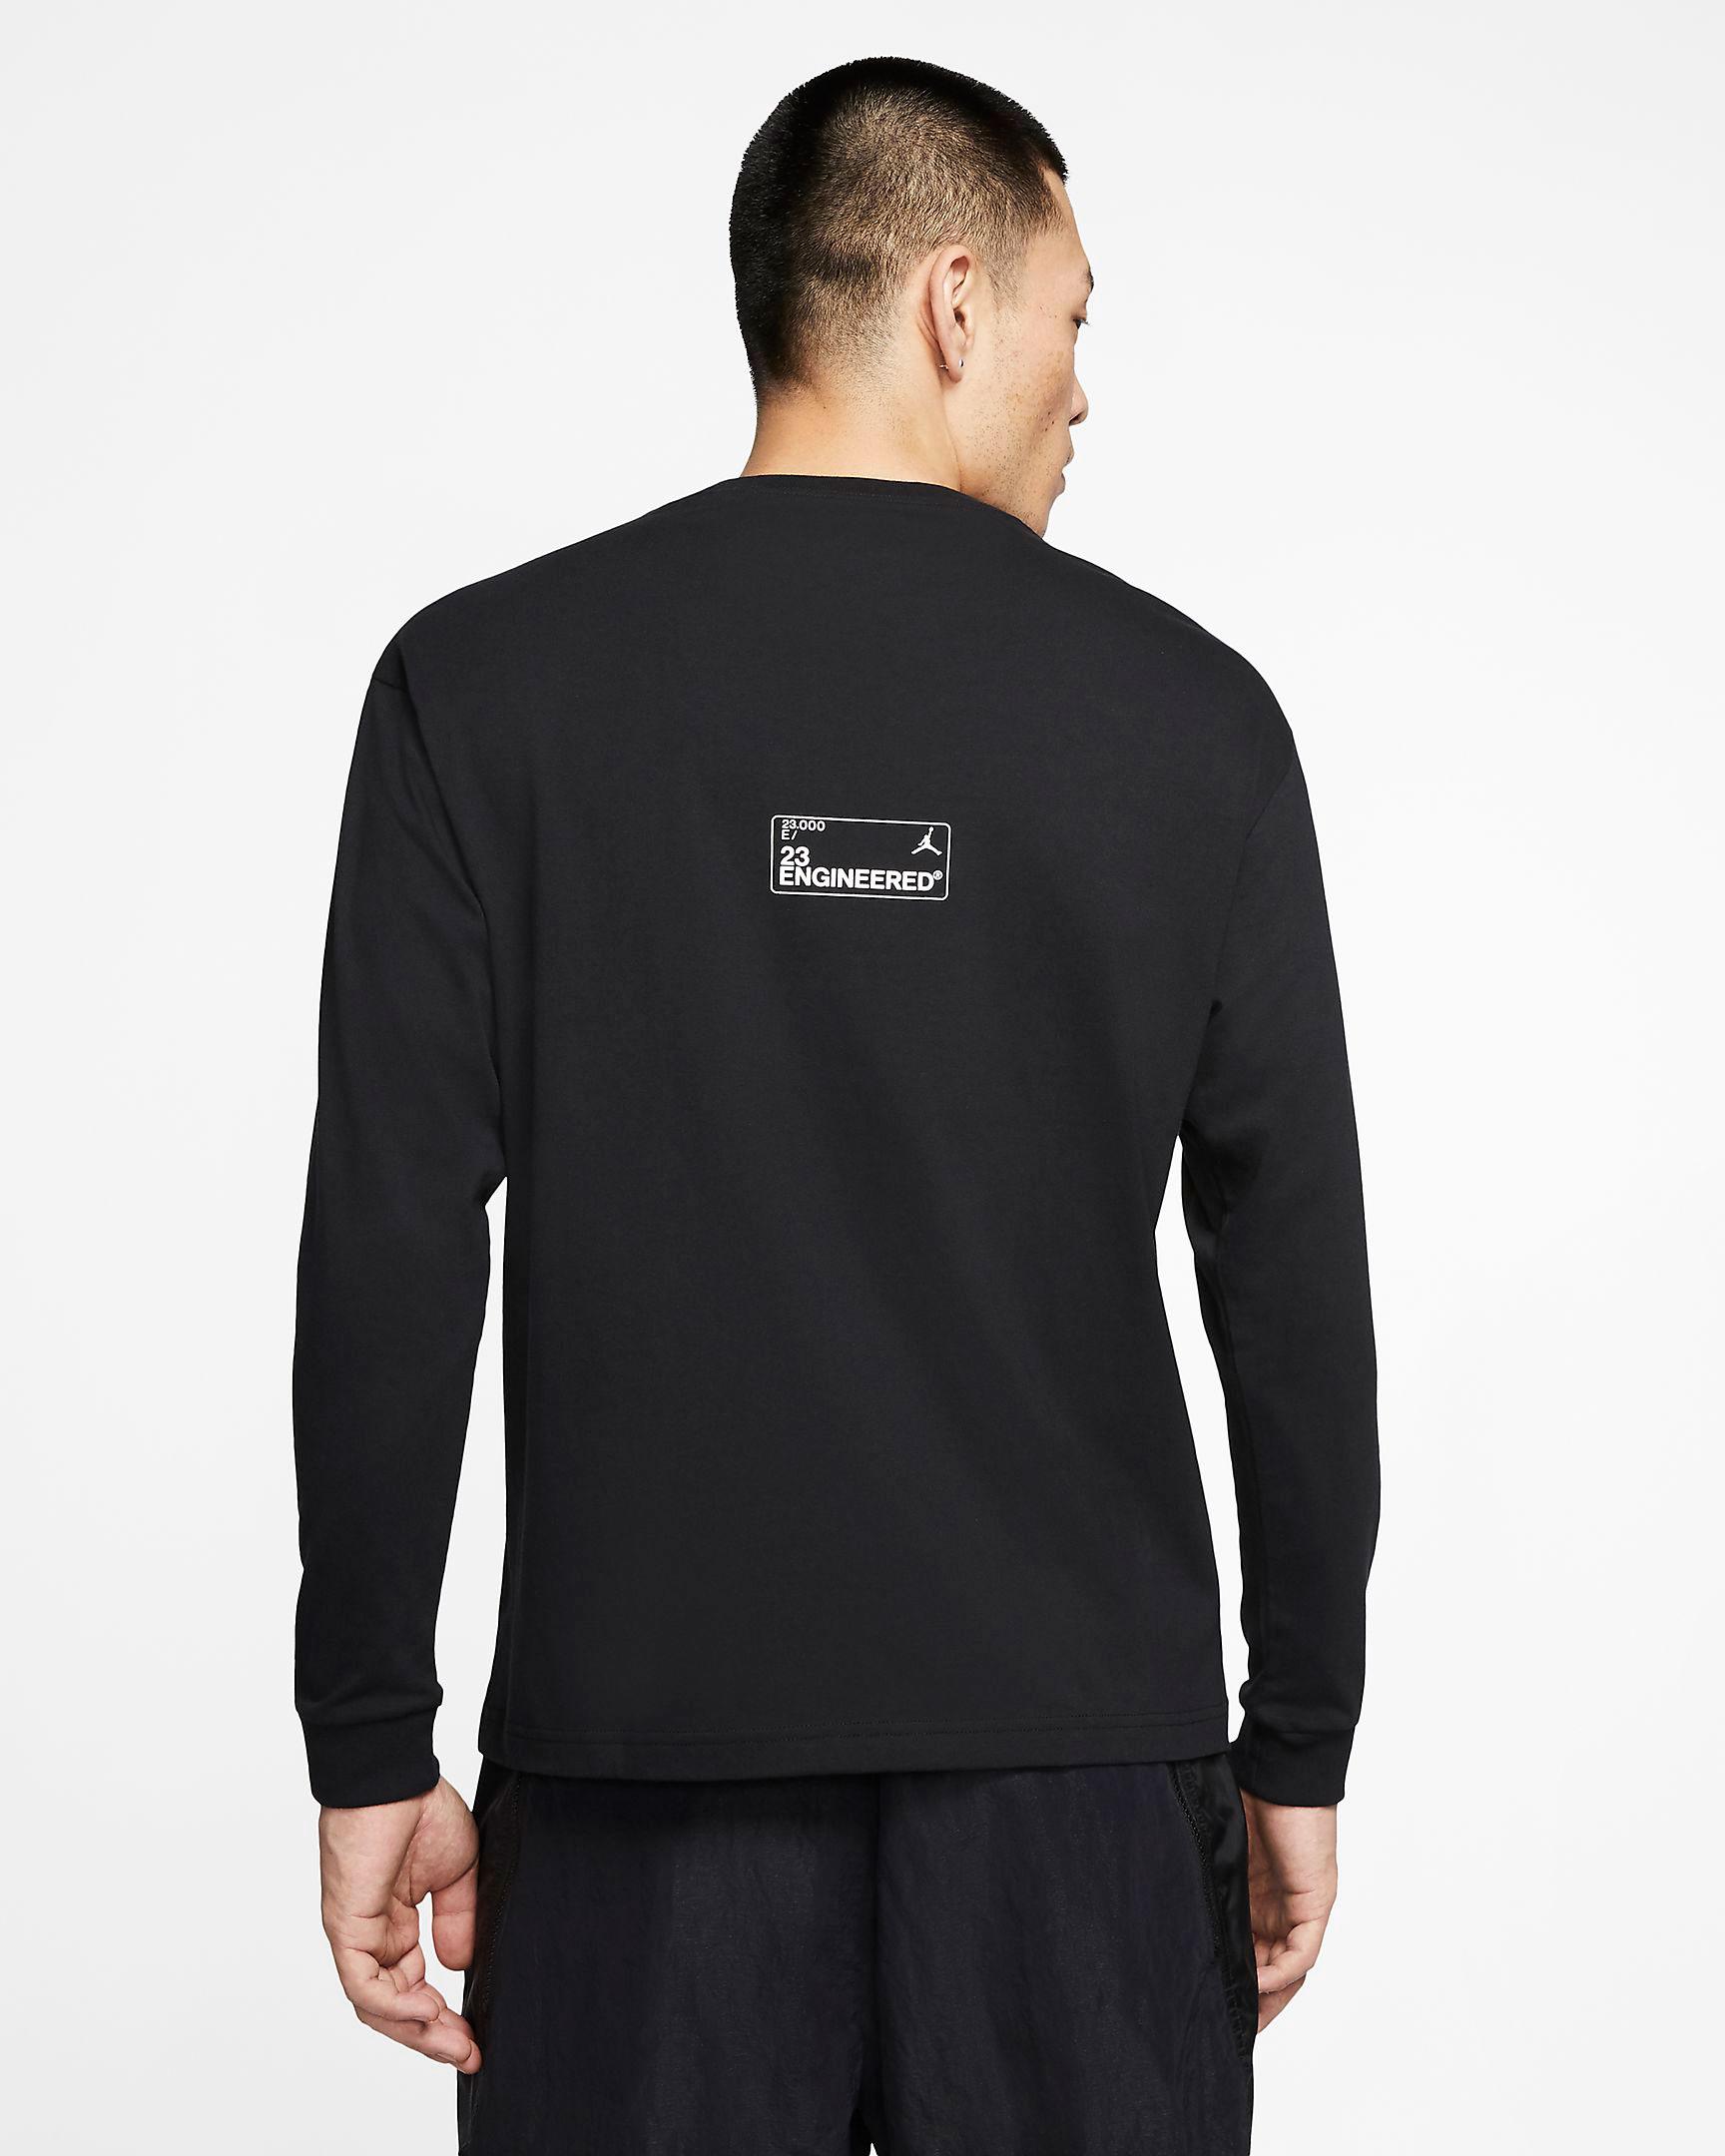 jordan-23-engineered-long-sleeve-shirt-black-red-2